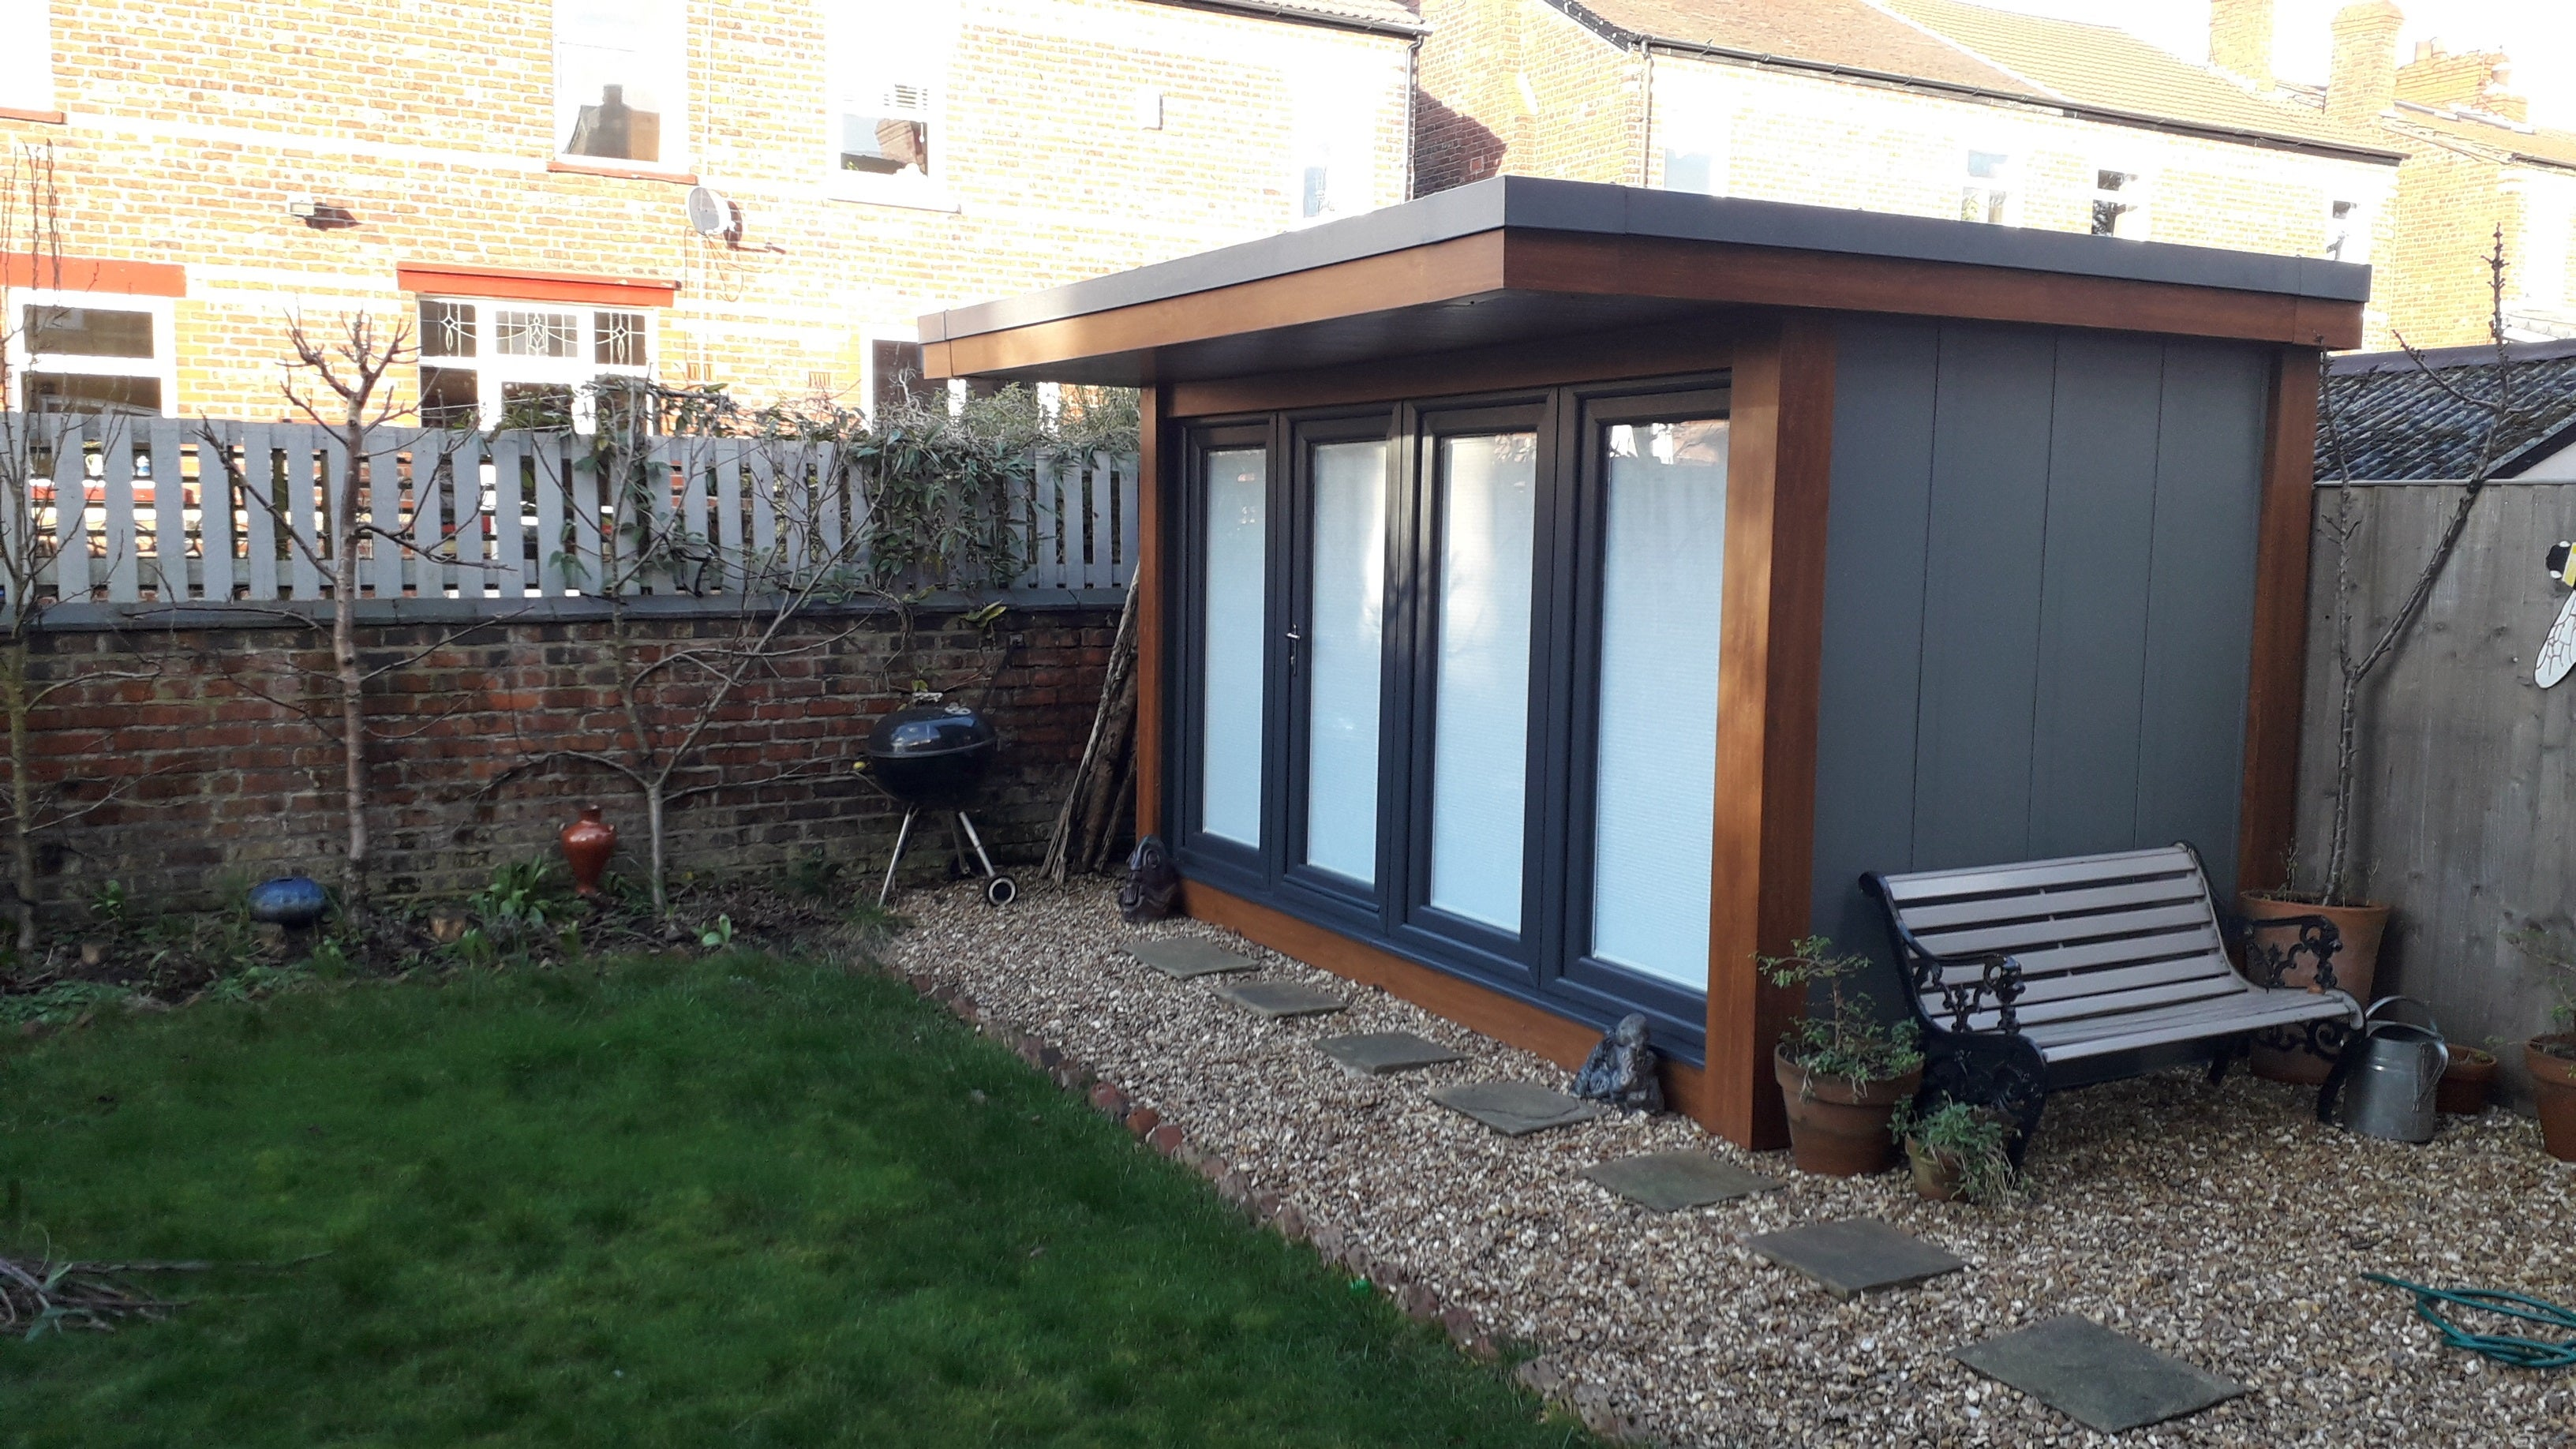 Sarah Butler's garden studio